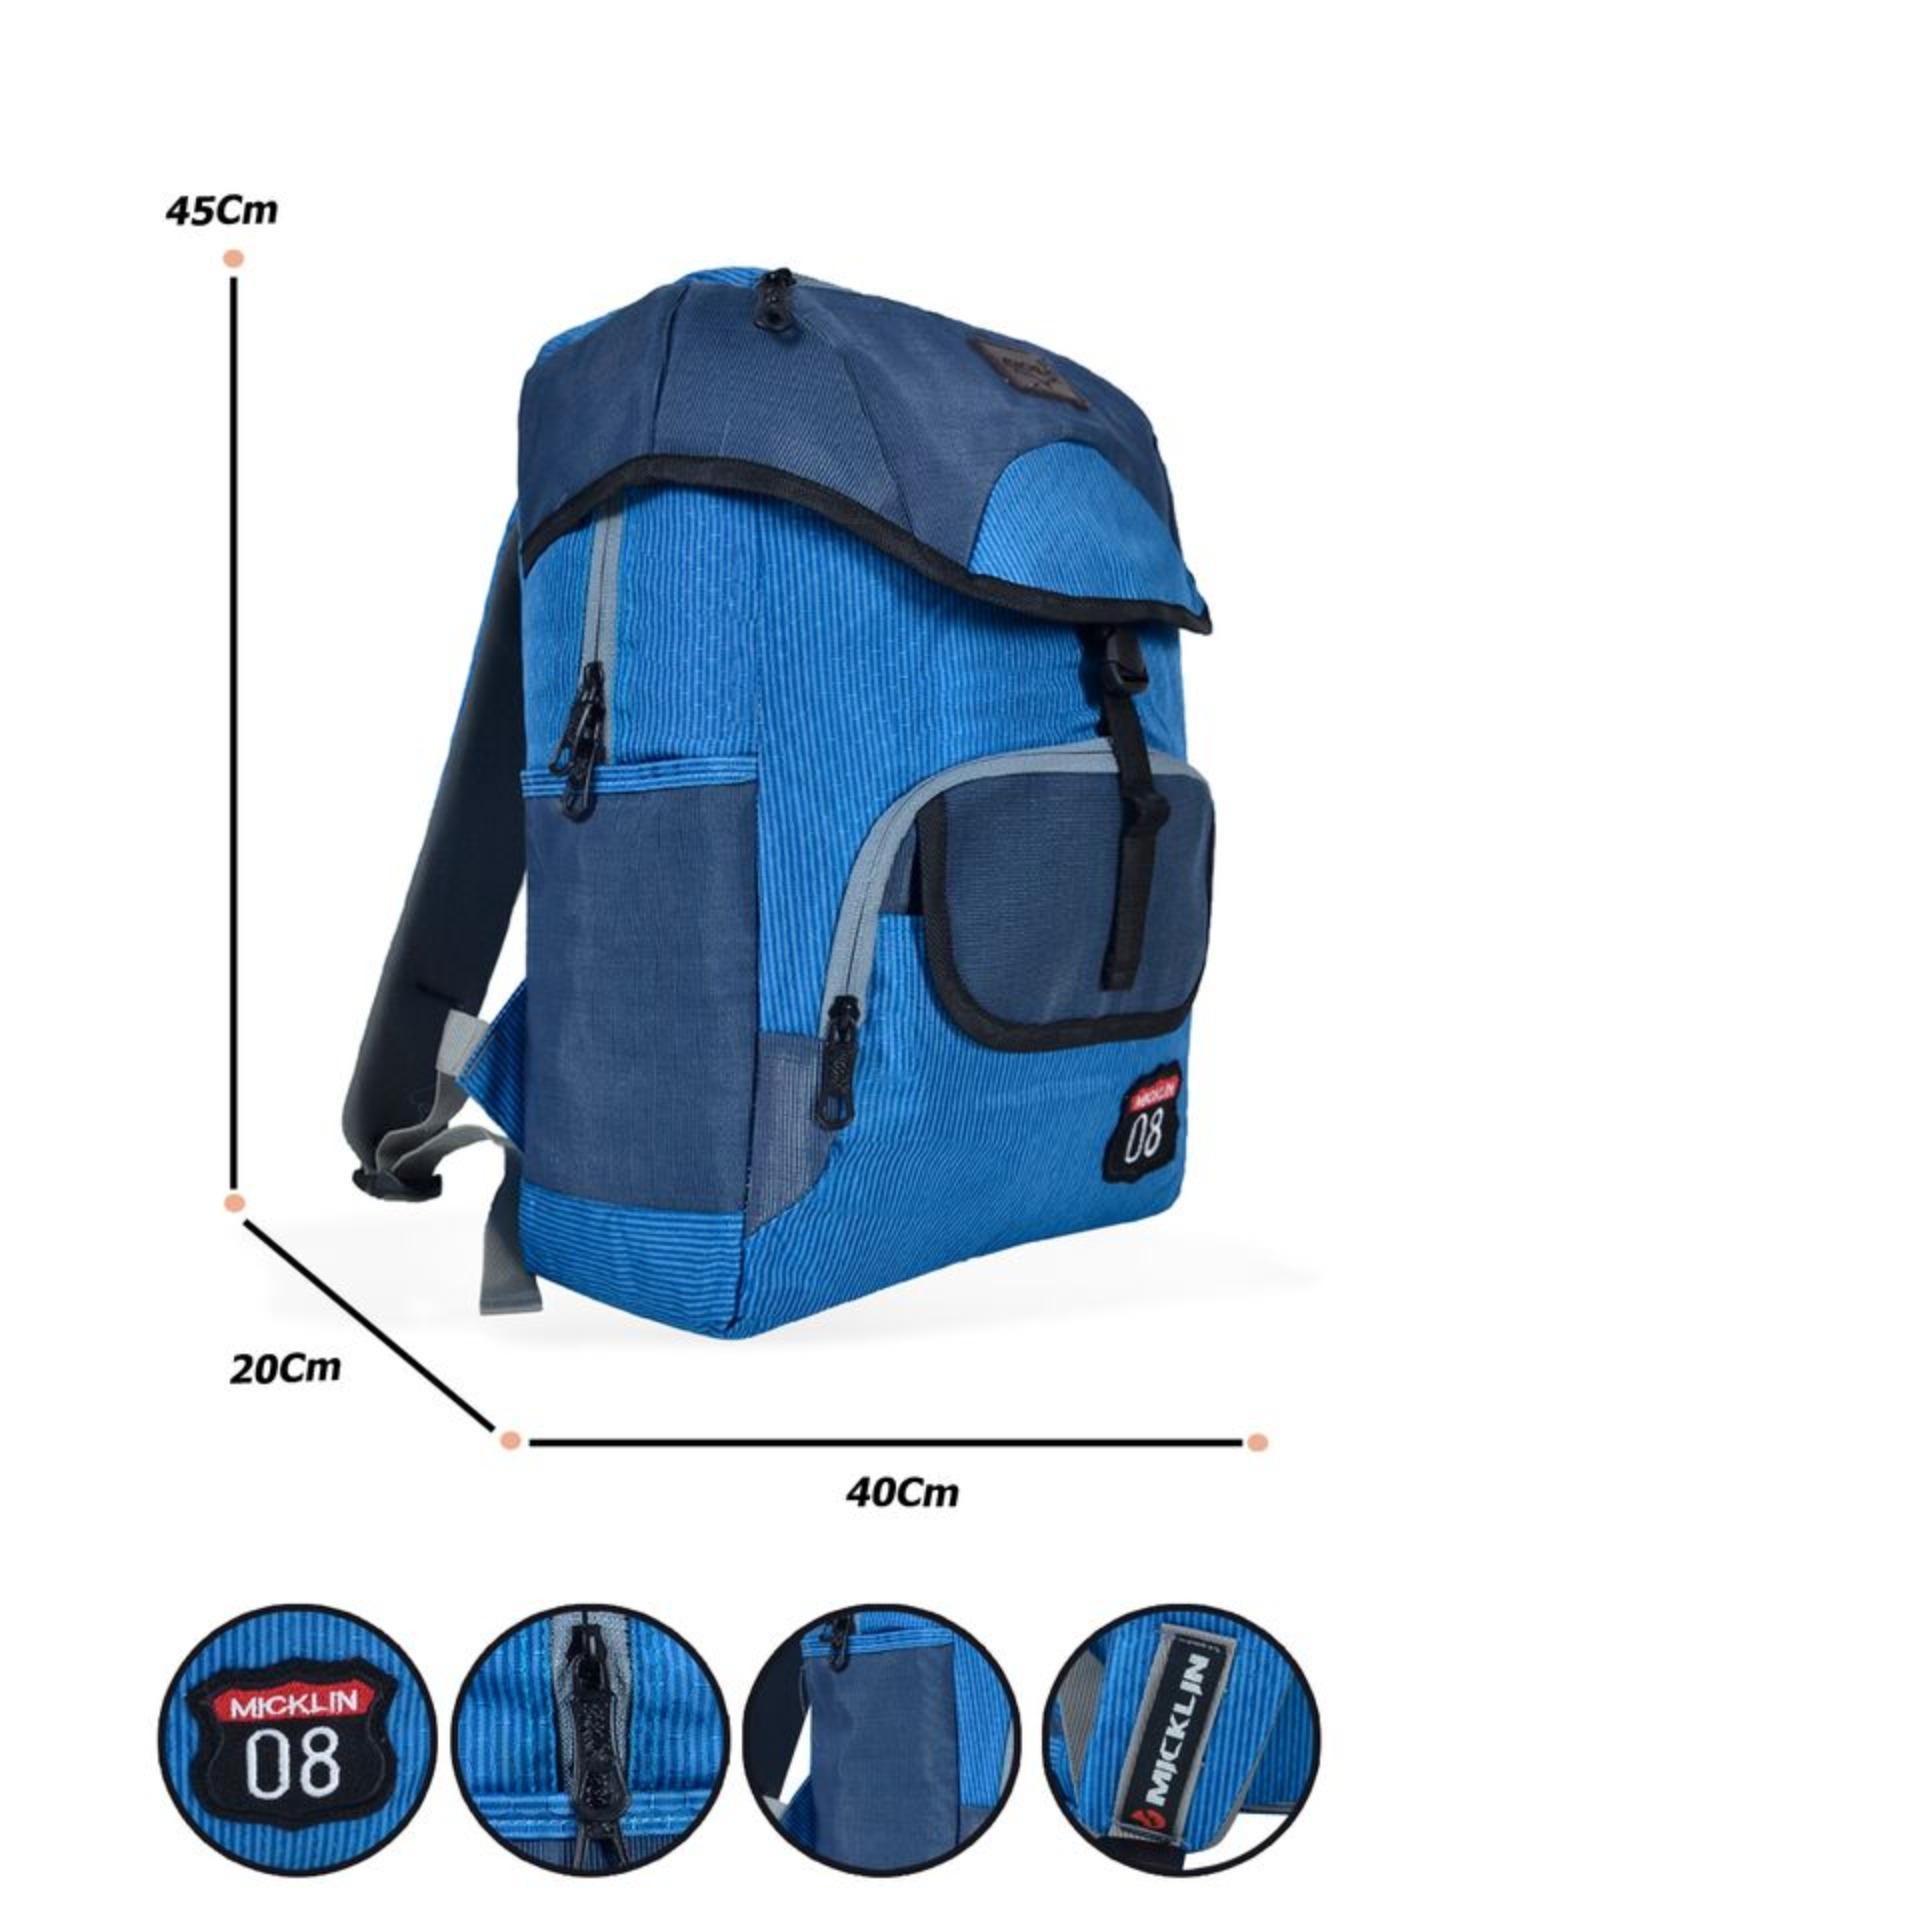 Micklin Backpack Tas Ransel Pria Korean Style Design 17 Inchi 1130-17 Polyester + Raincover